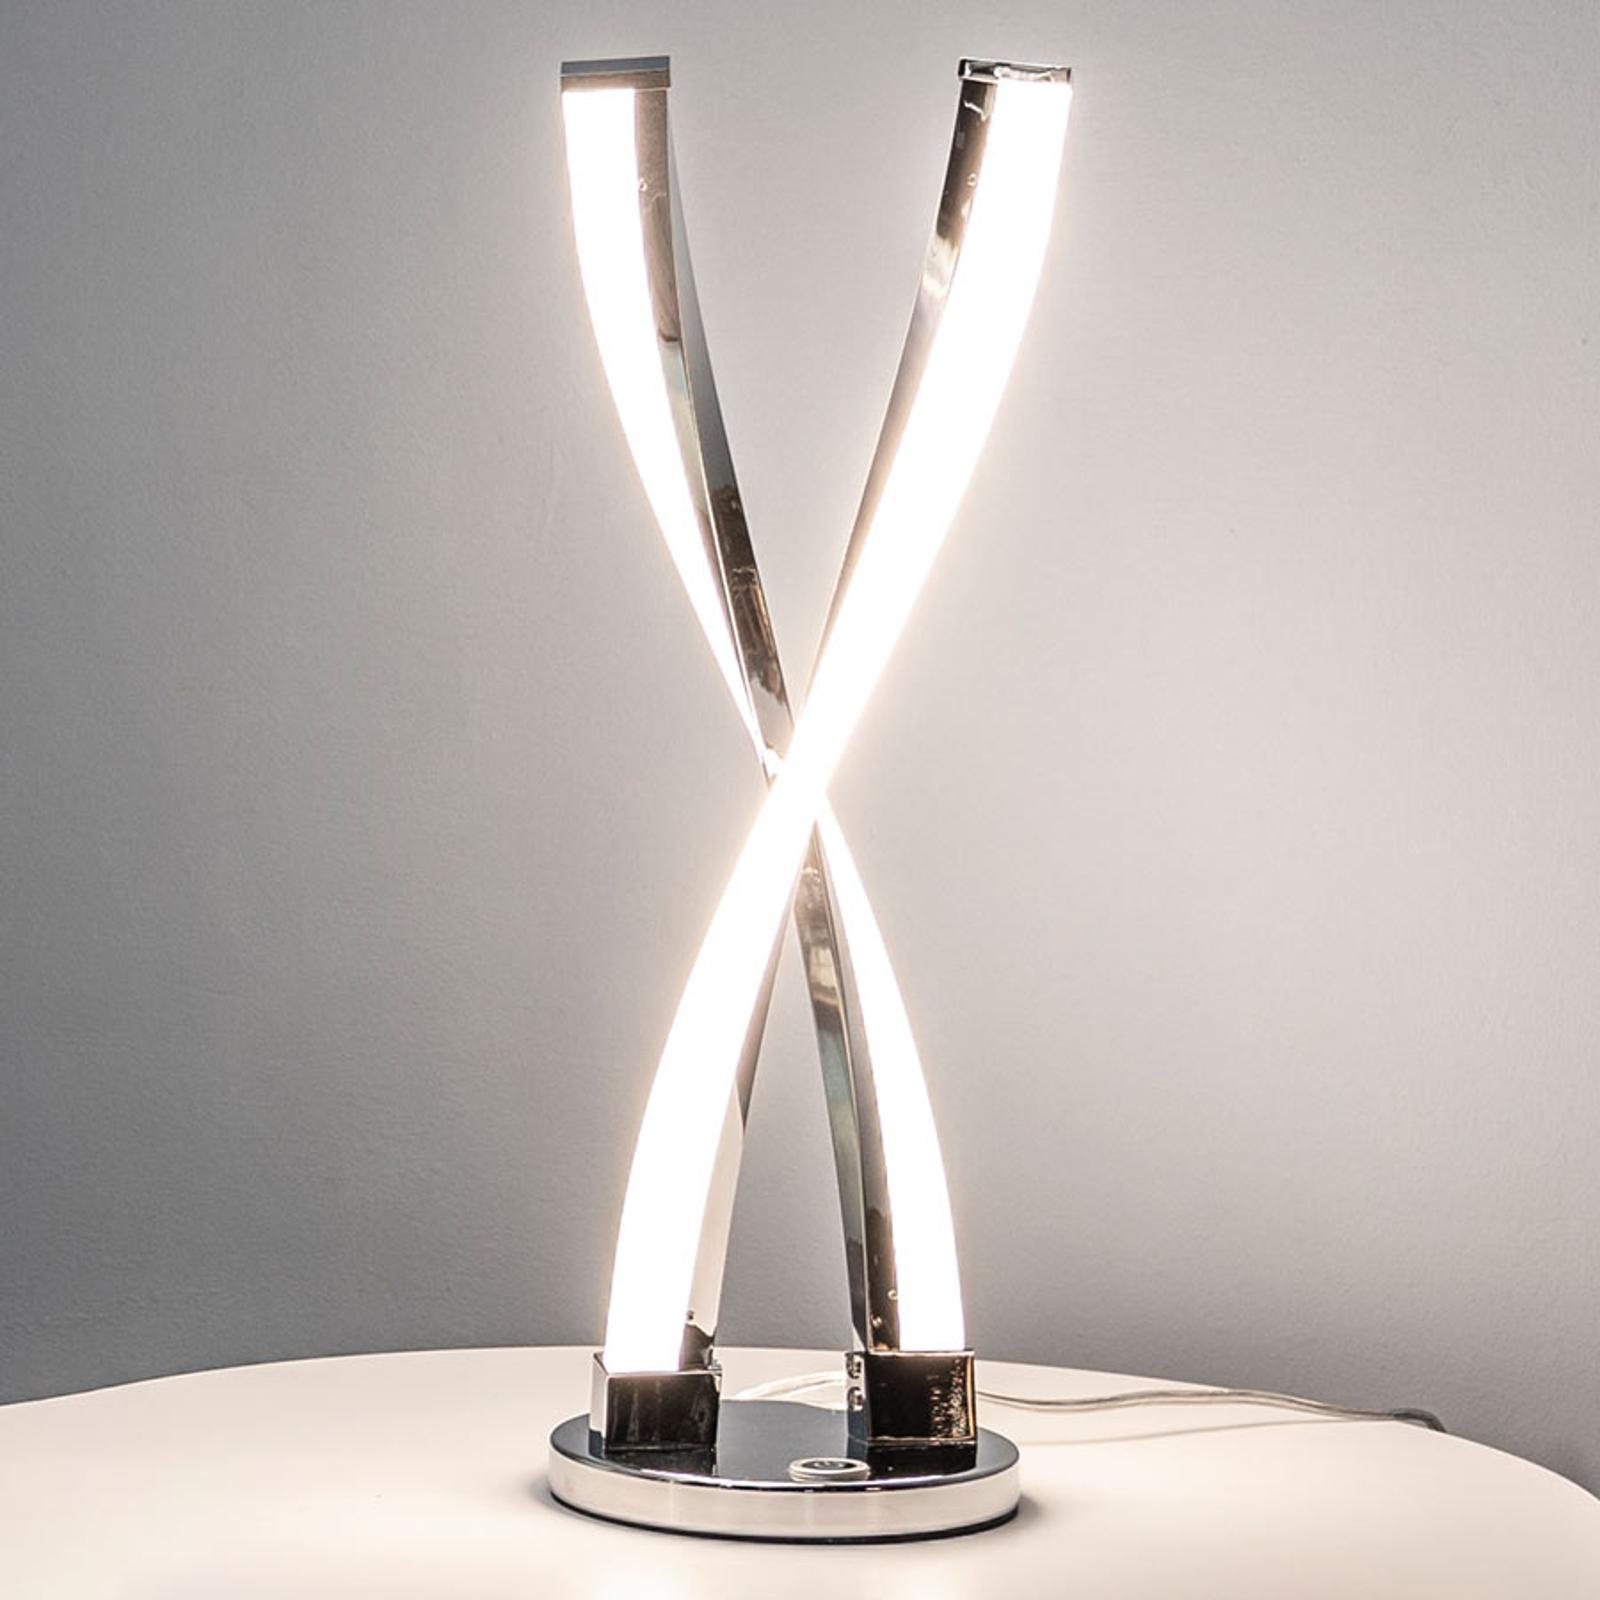 LED-Tischleuchte Idana, dimmbar